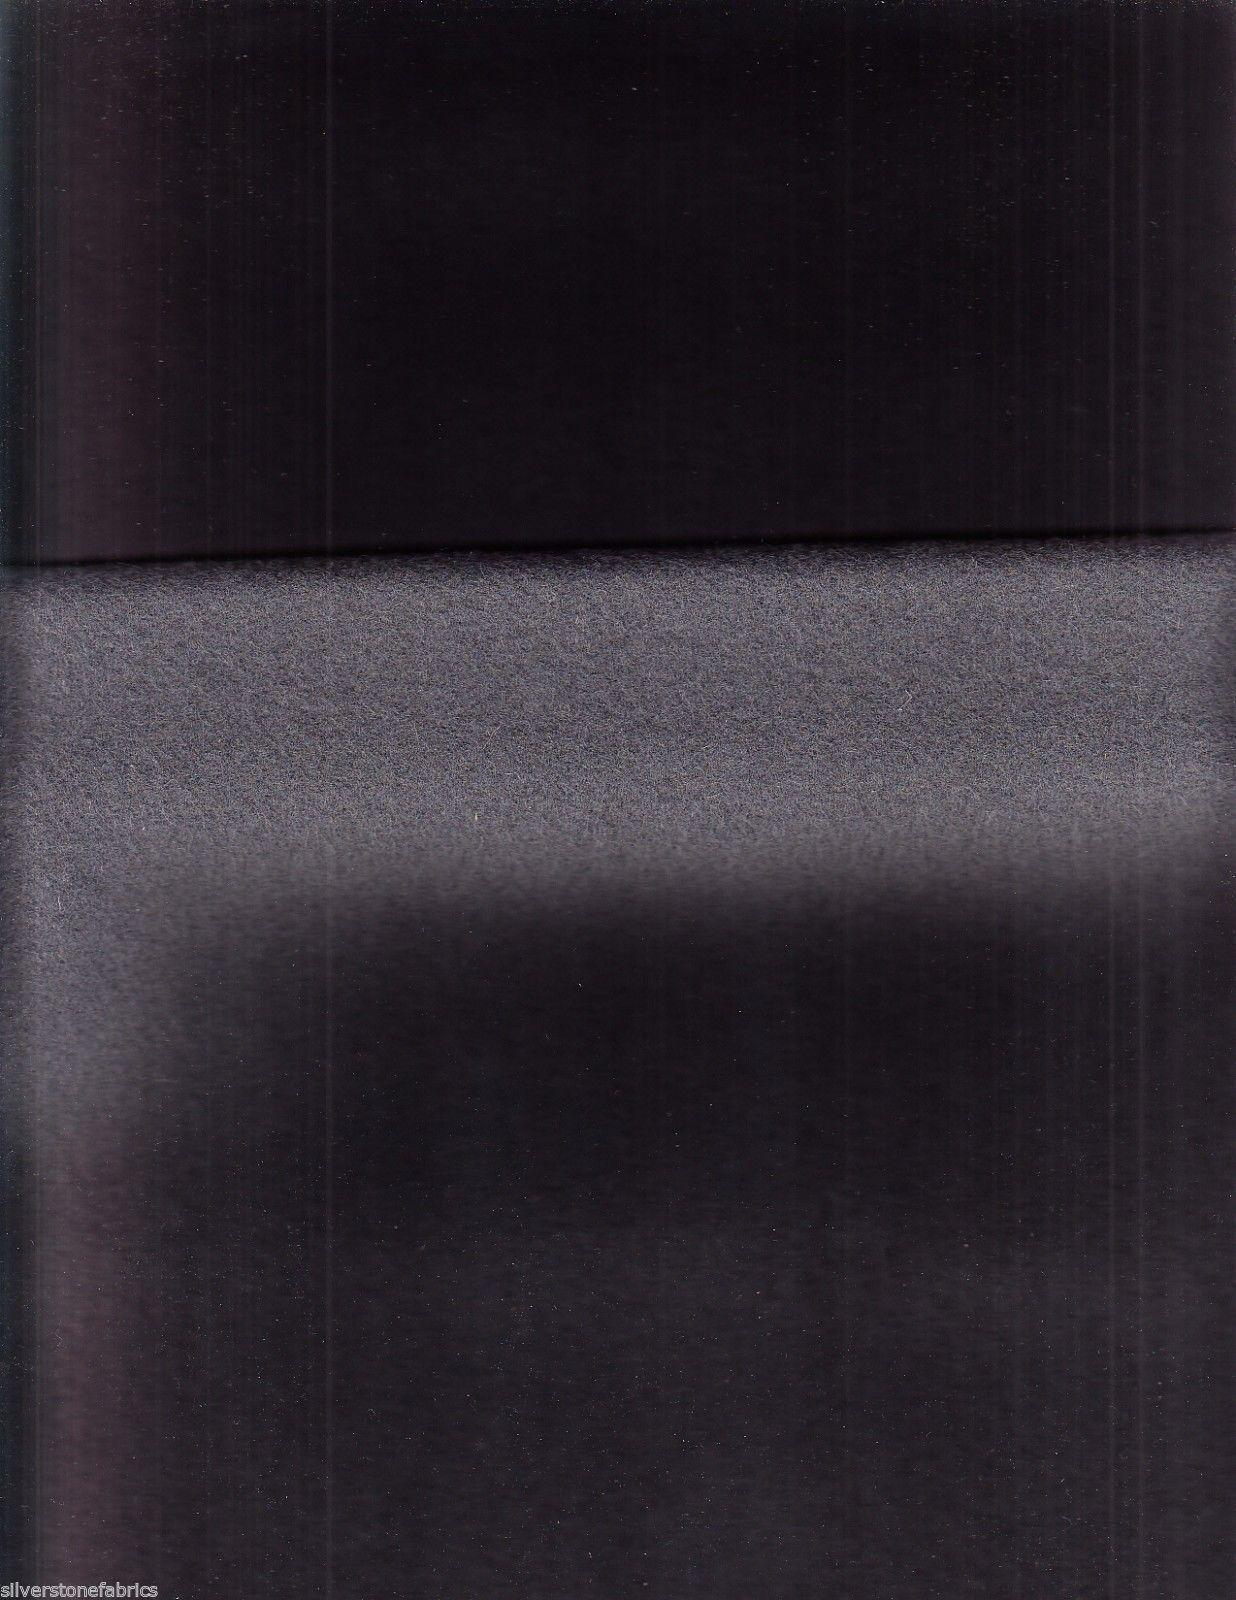 Mid Century Modern Upholstery Fabric Wool Felt 6512314 Grey 2 yards DM5